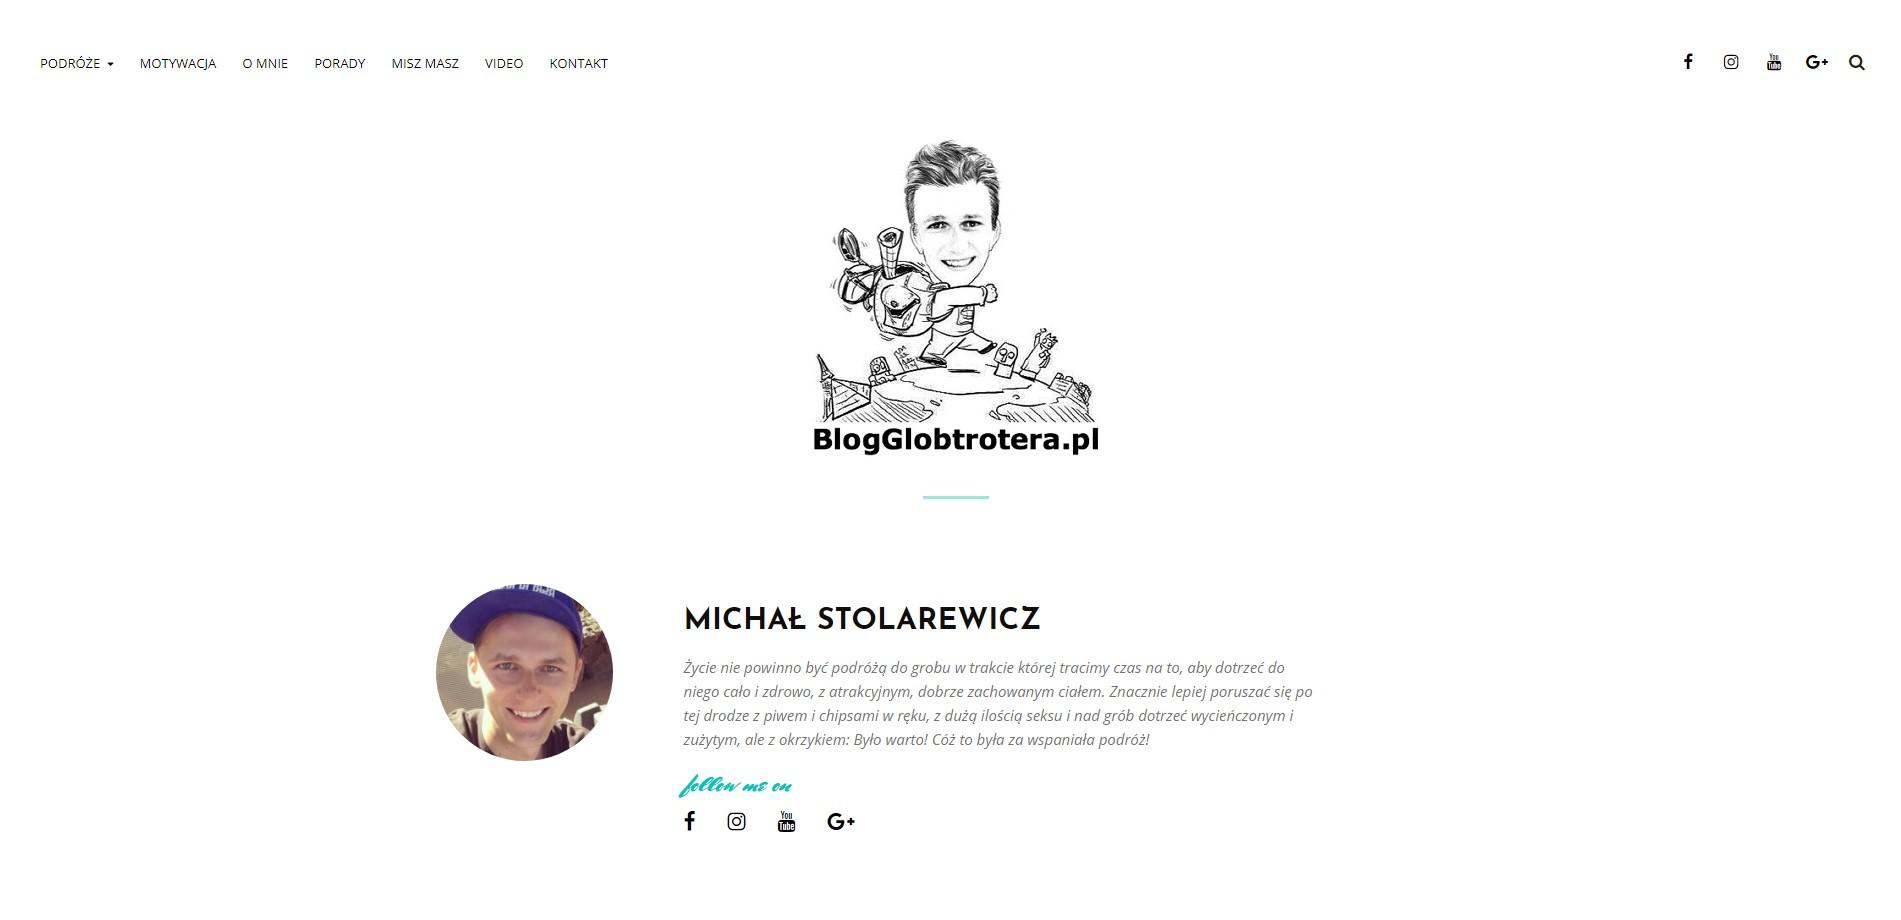 Blog podróżniczy blogglobtrotera.pl